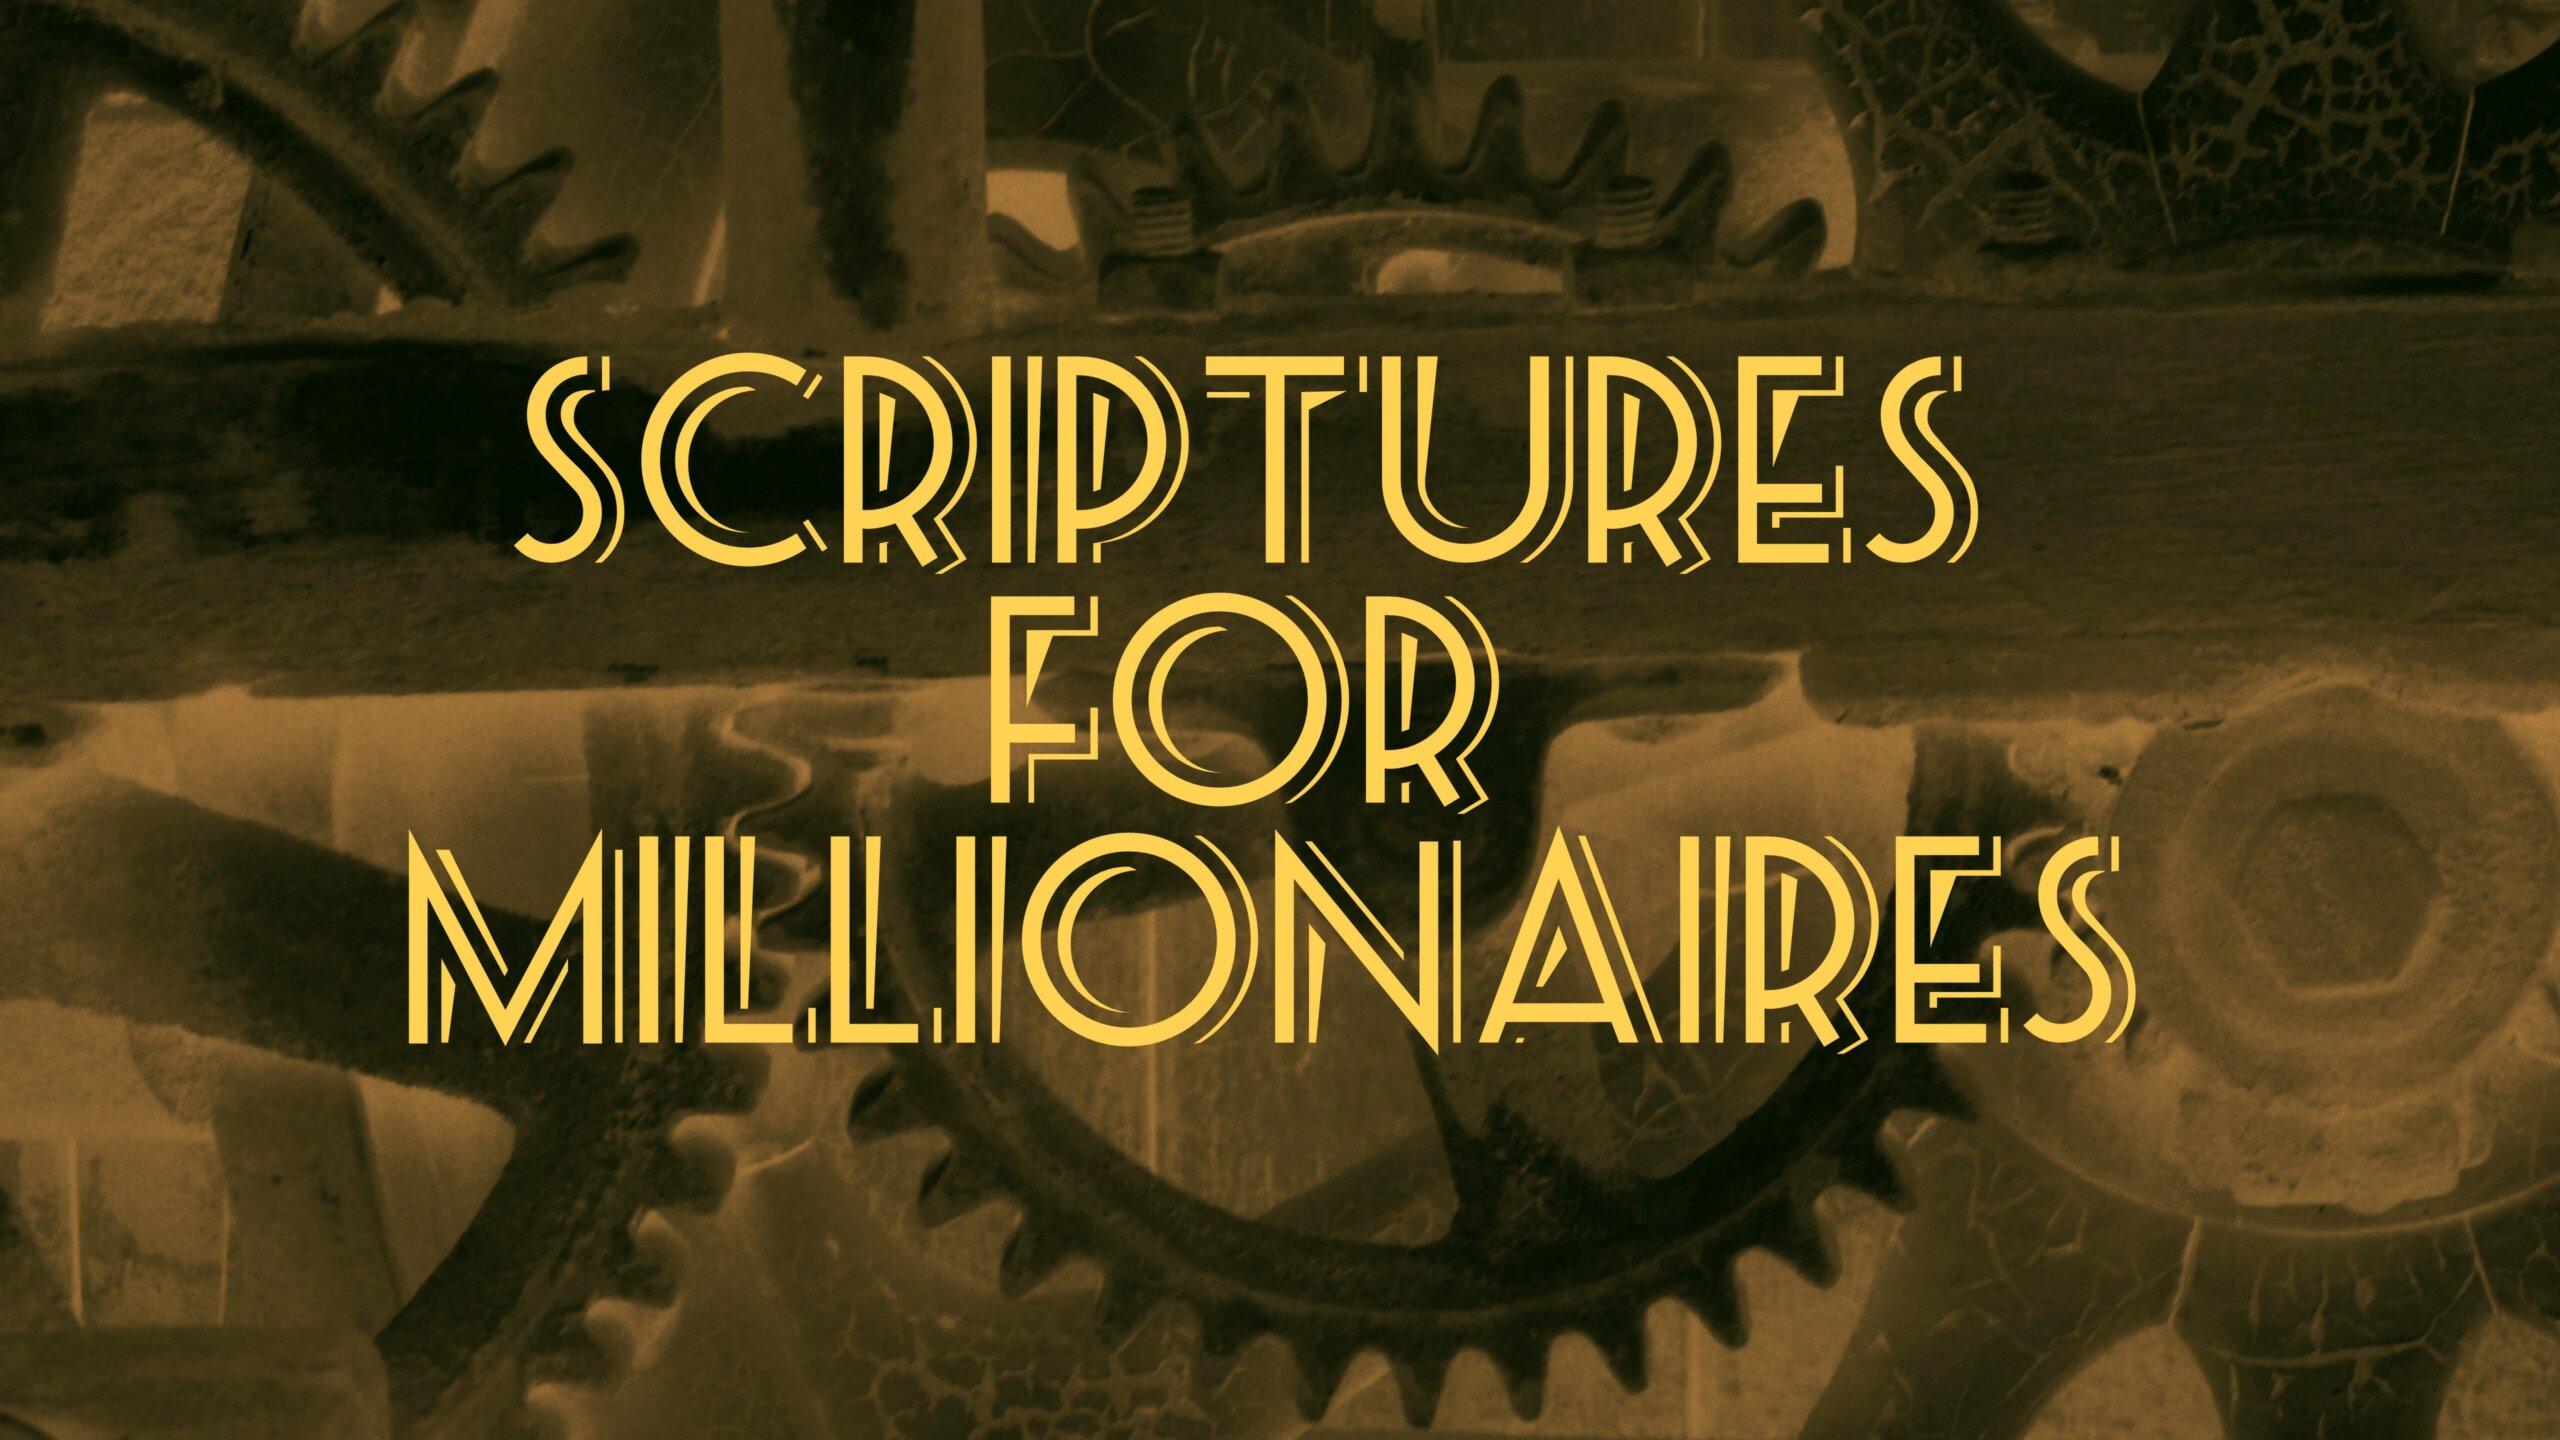 Scriptures for Millionaires